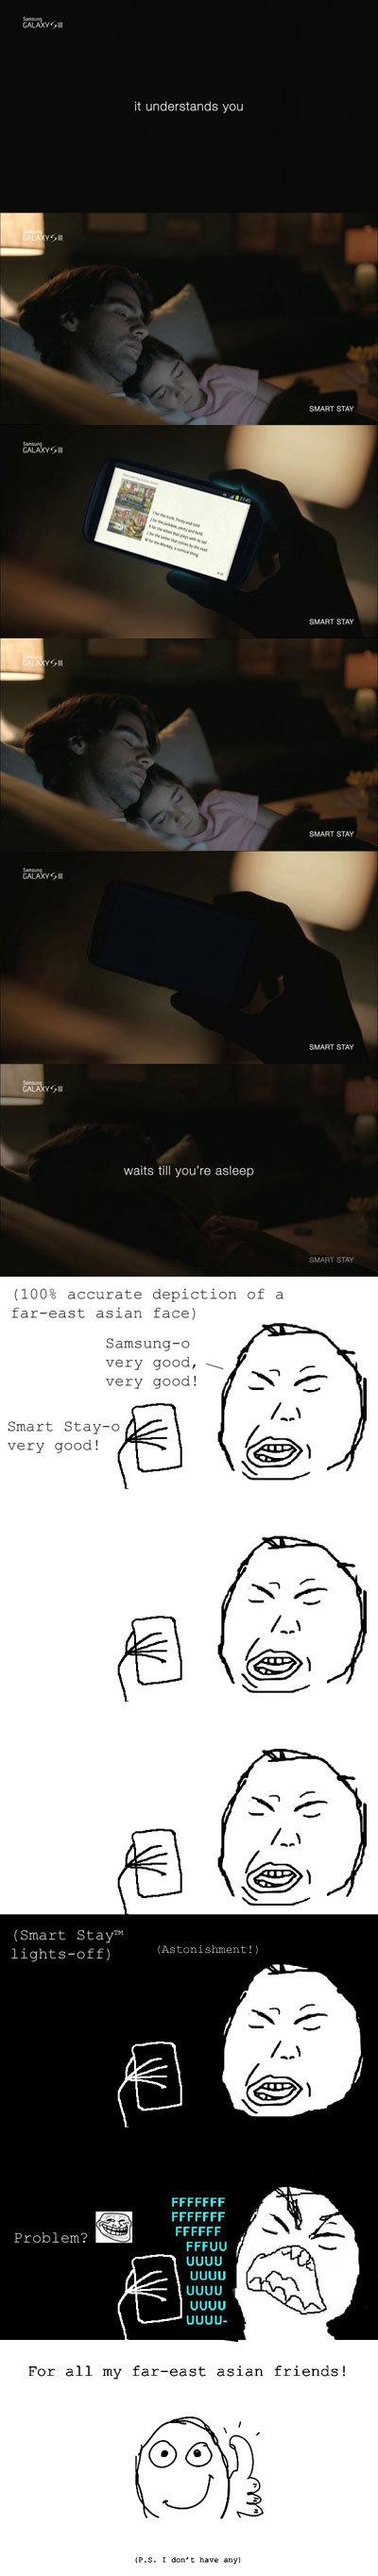 Samsung smart stay in far-east. Please don't cook my dog for this.. Asian samsung galaxy john wayneo sleep eyes